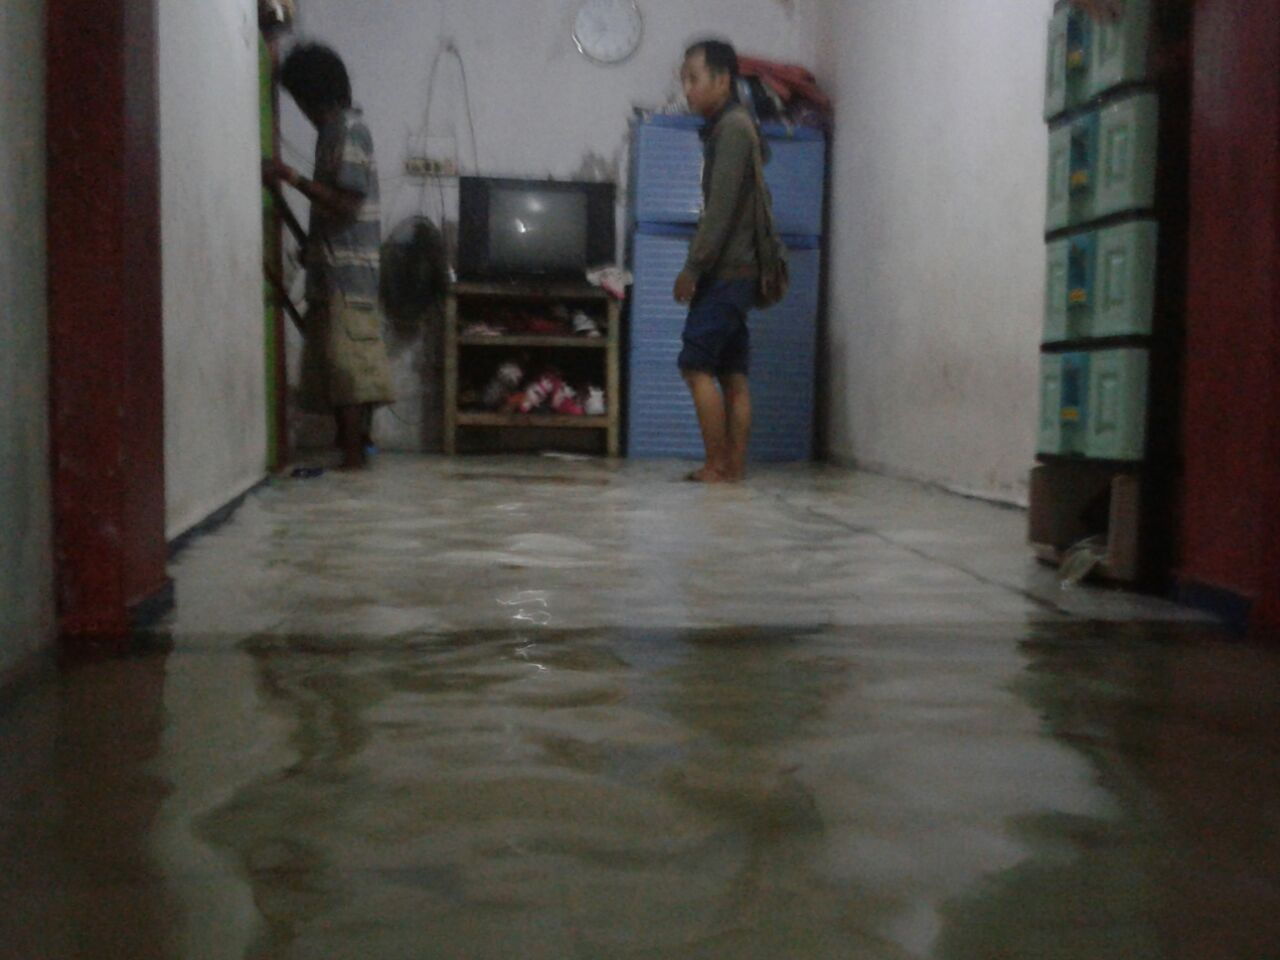 Warga Diimbau Jauhi Aliran Listrik Saat Rumah Tergenang Air Laut